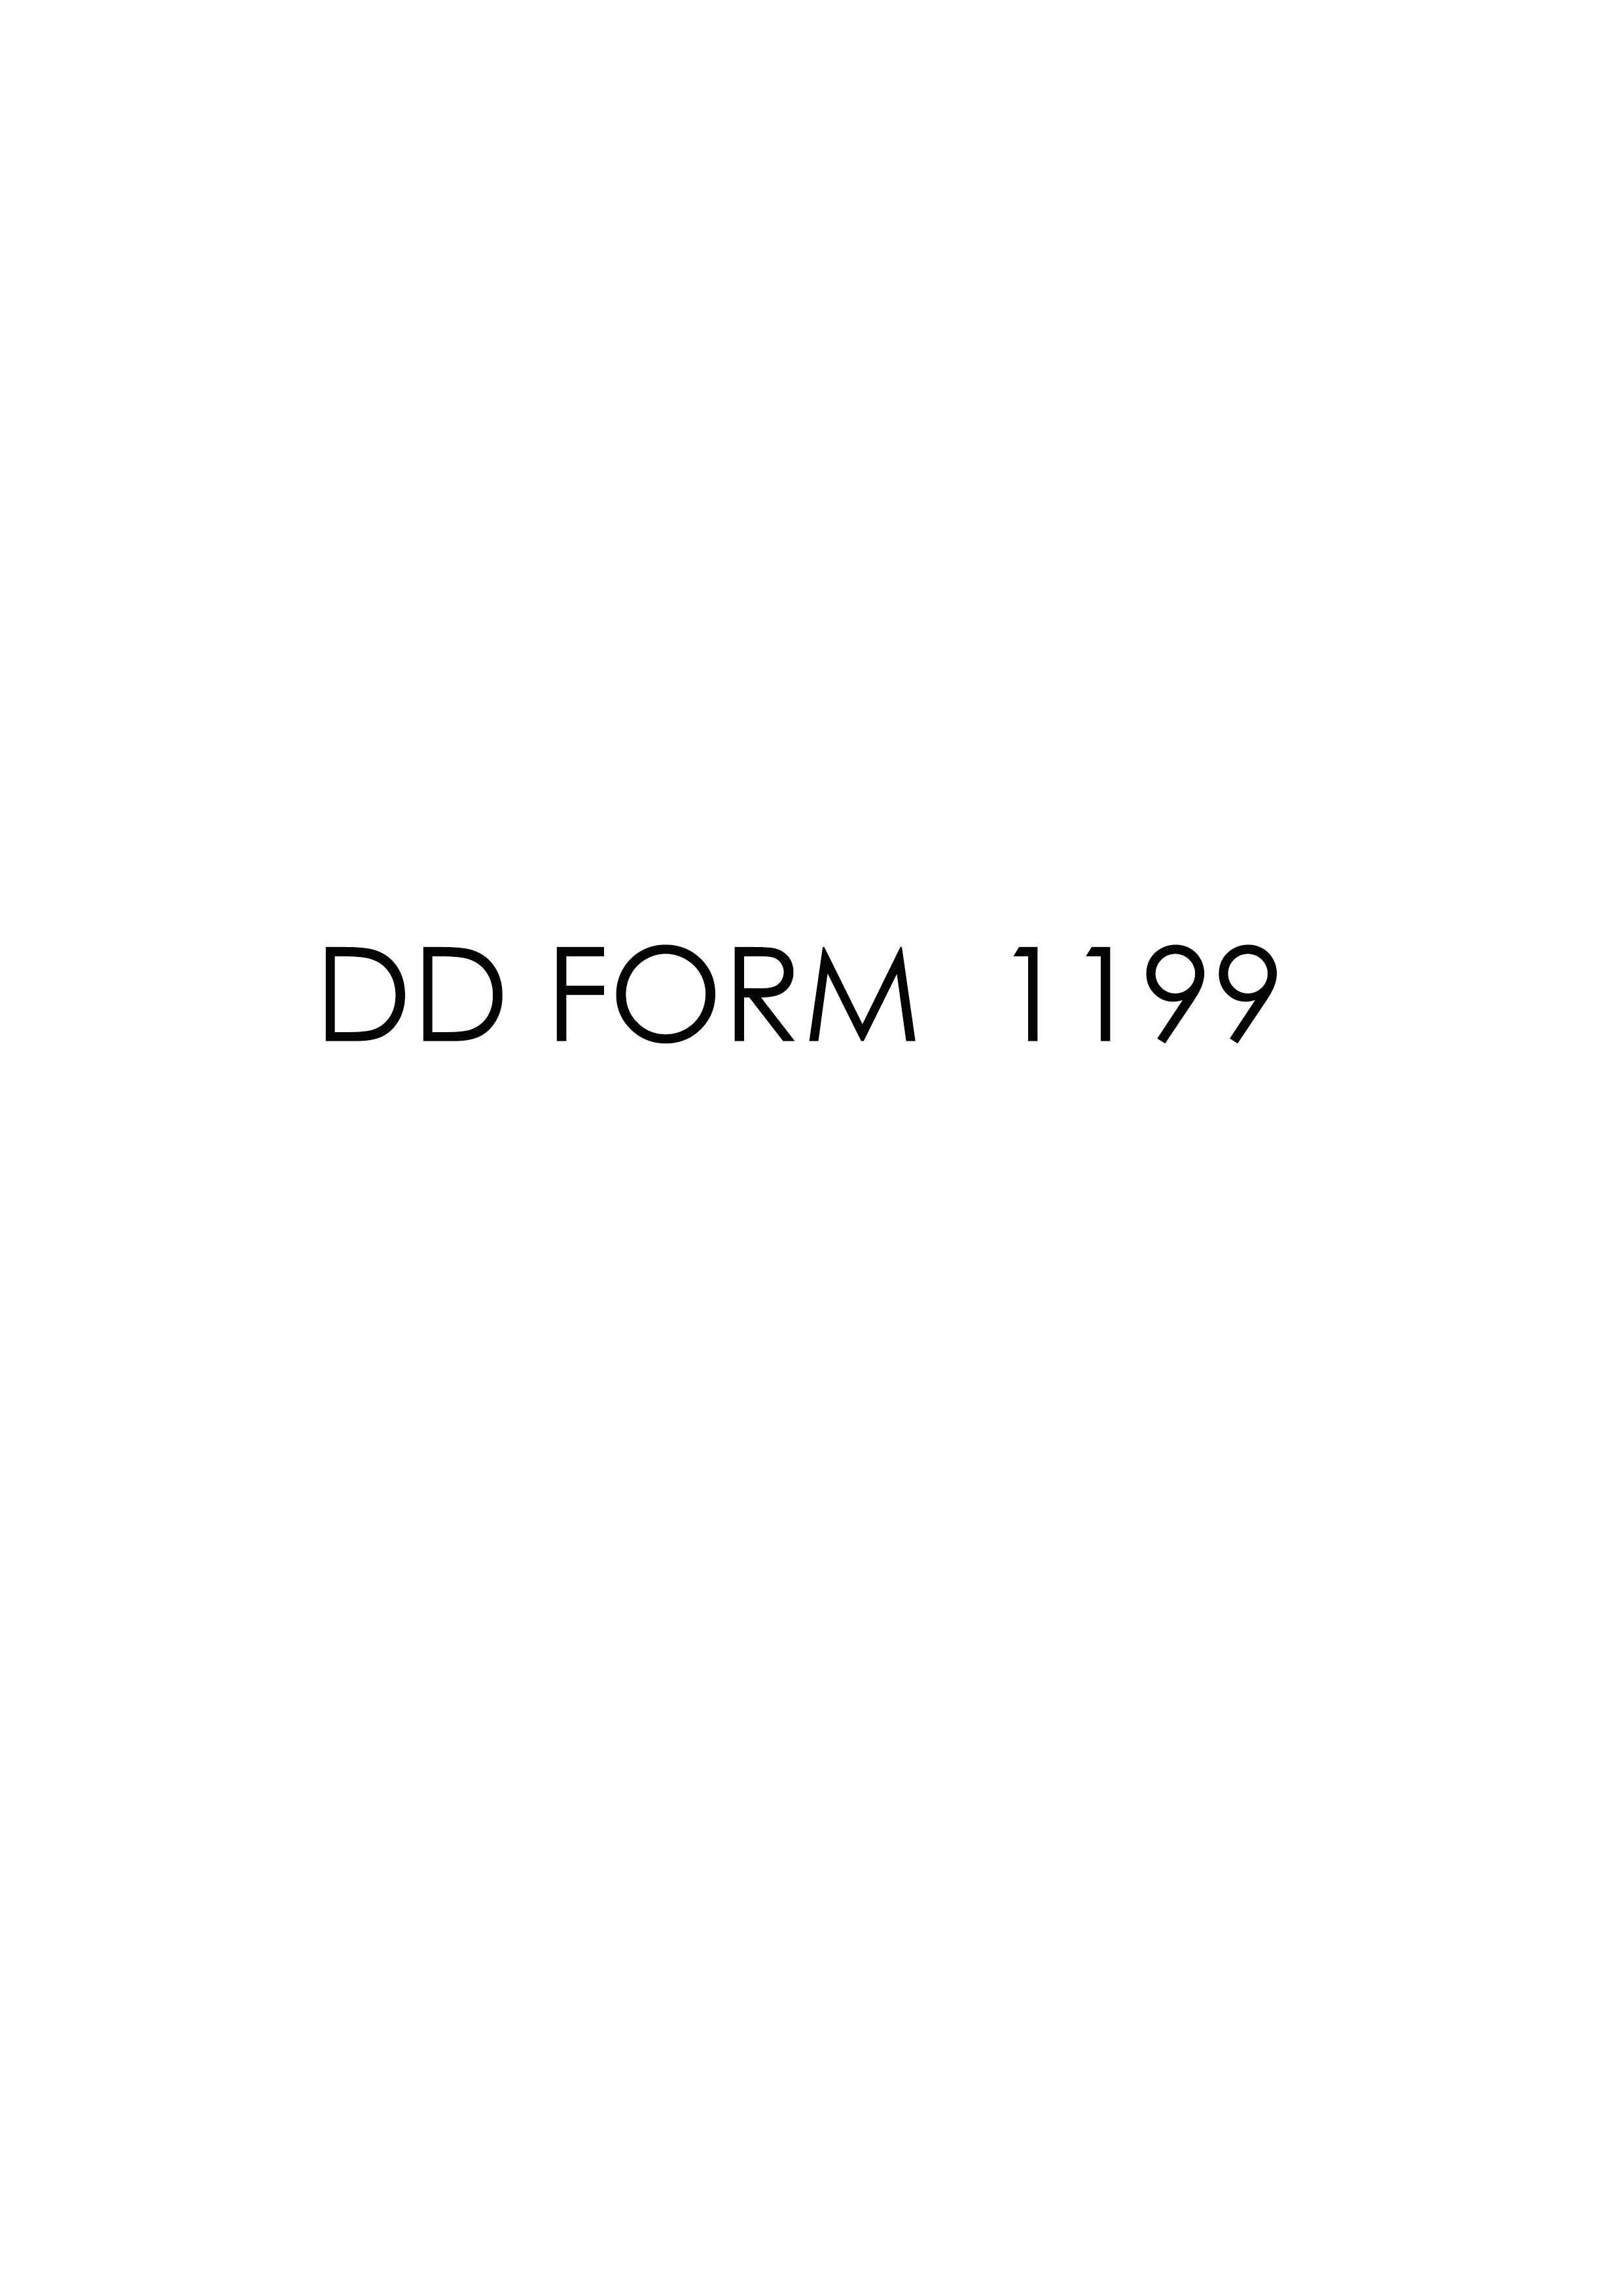 Download dd Form 1199 Free